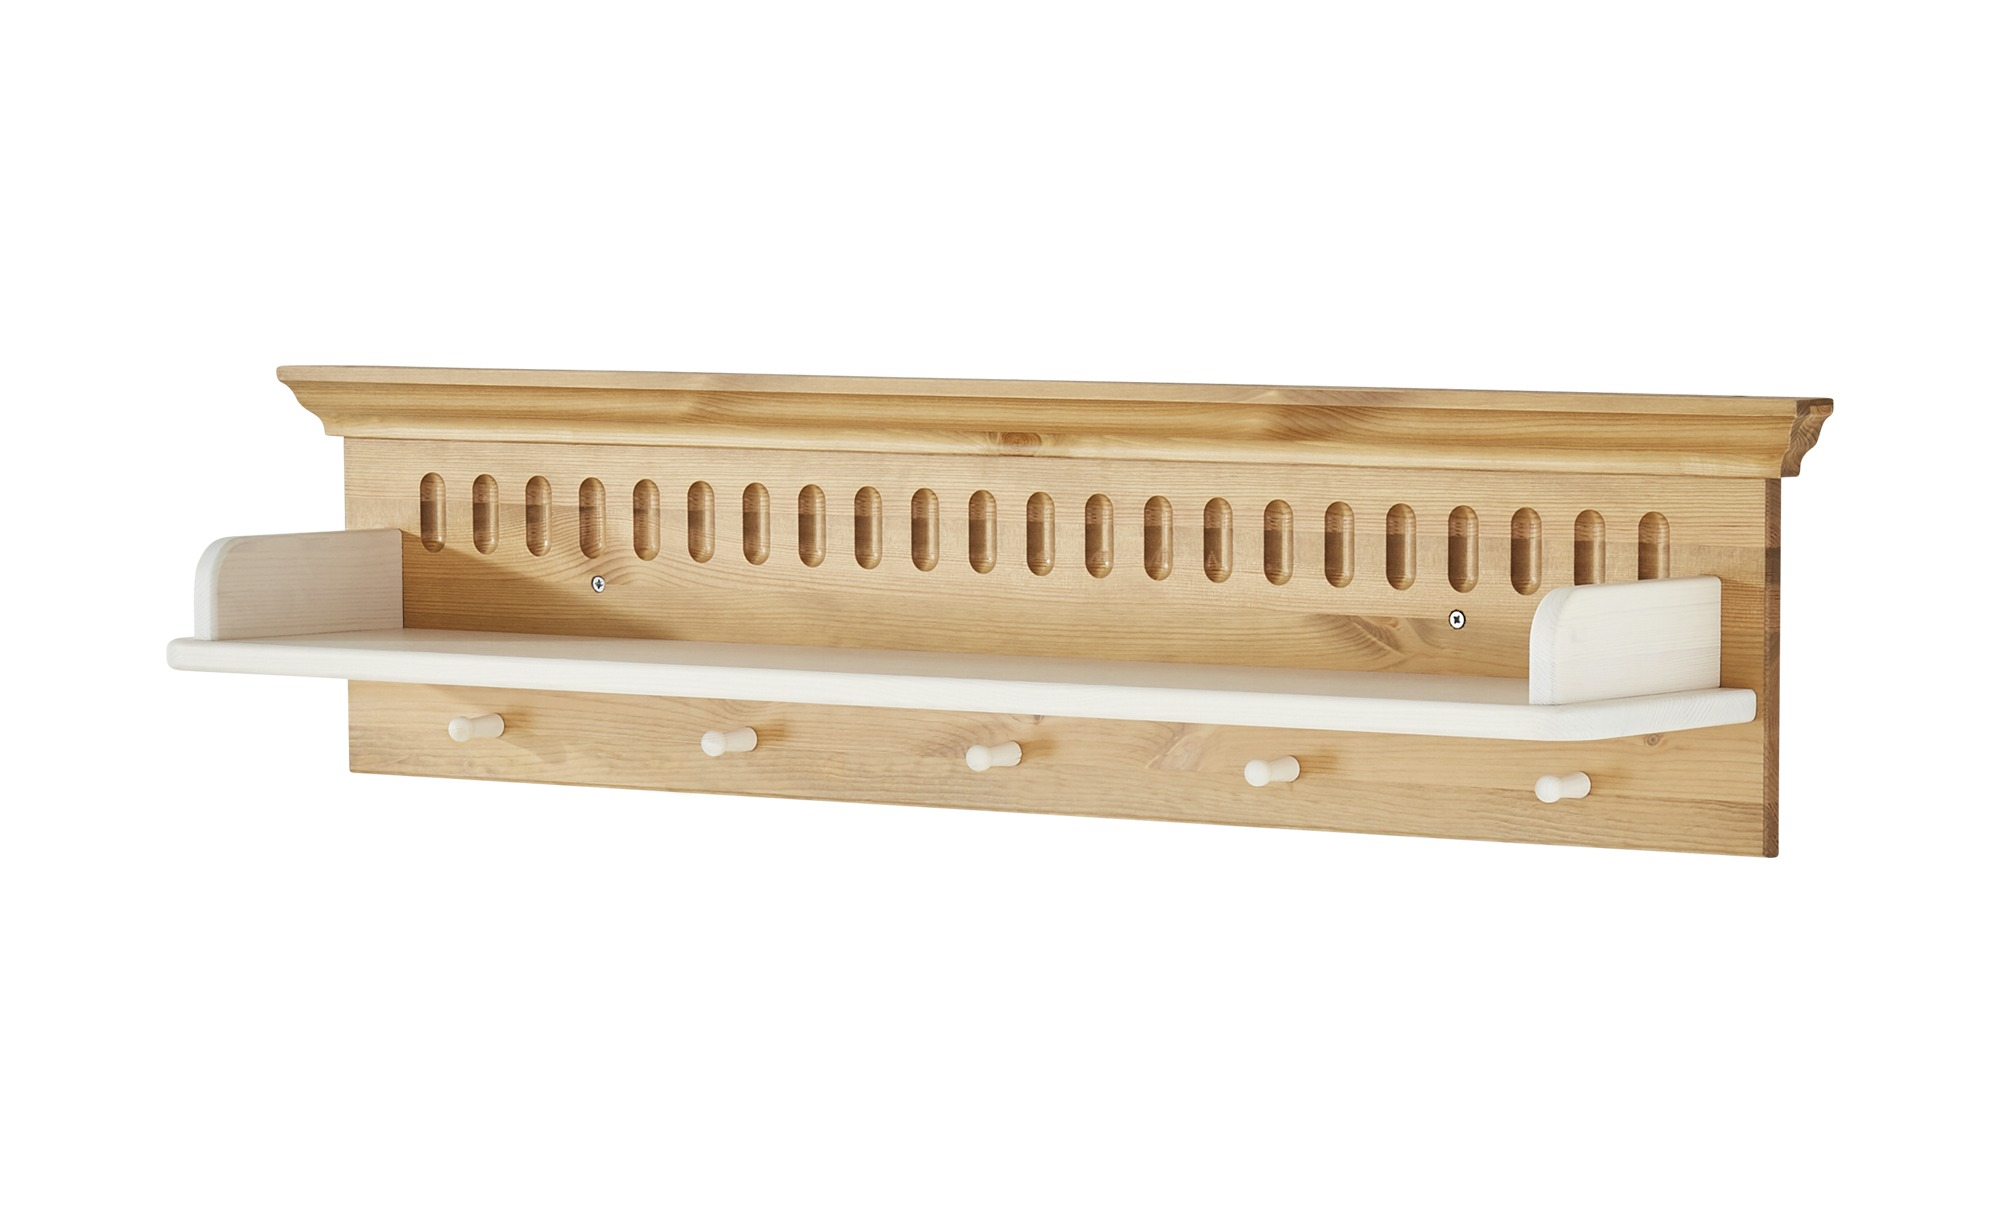 Wandboard - holzfarben - 107 cm - 26 cm - 21 cm - Jugendmöbel > Jugendregal günstig online kaufen